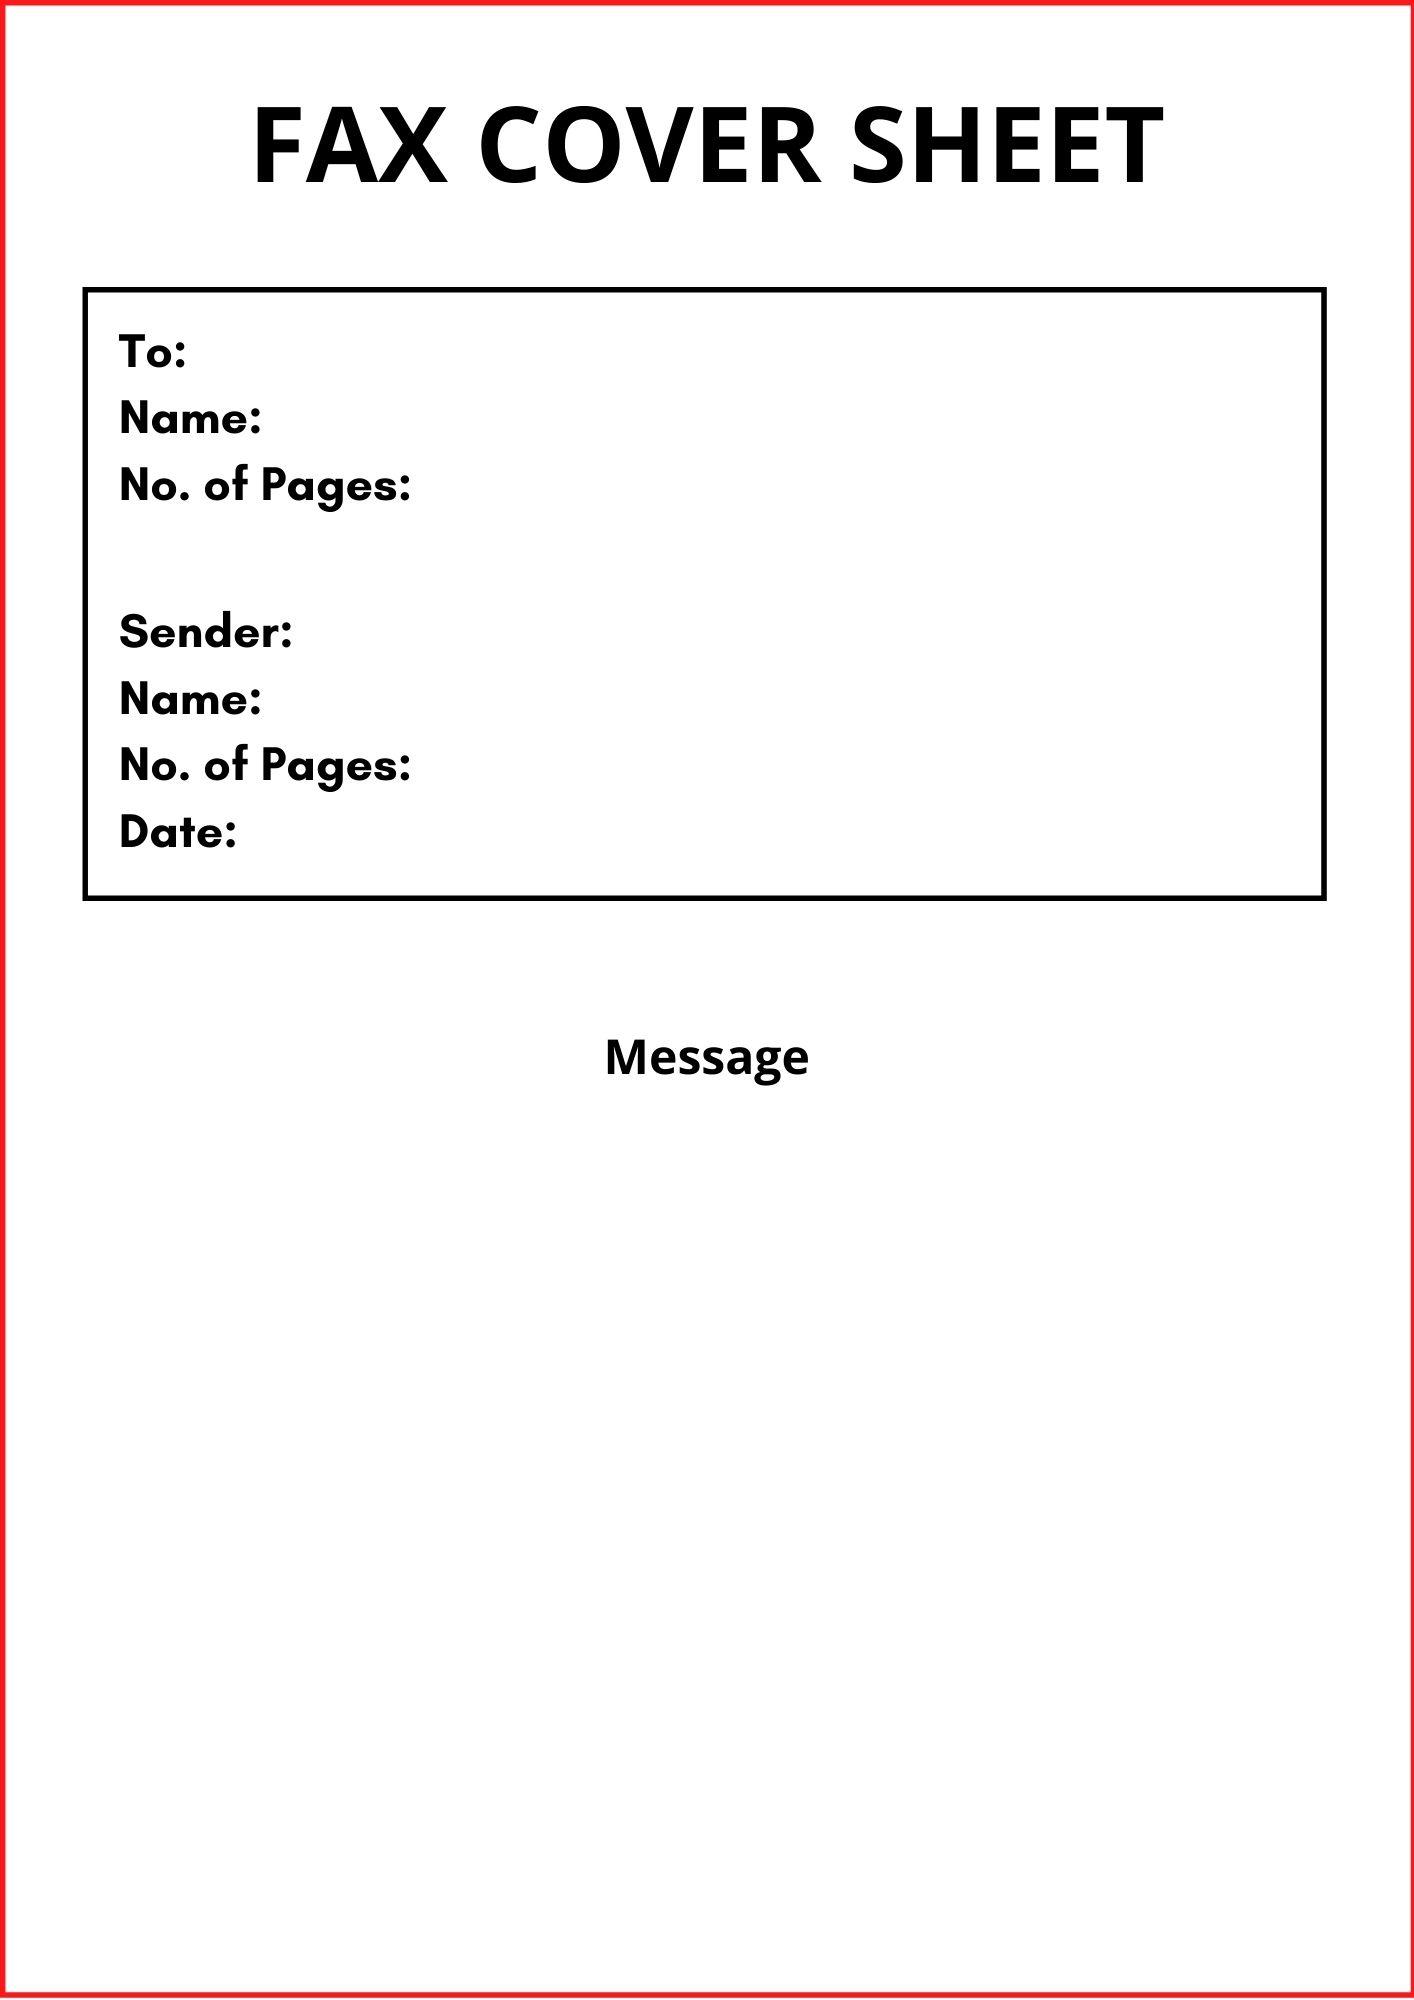 urgent fax cover sheet template